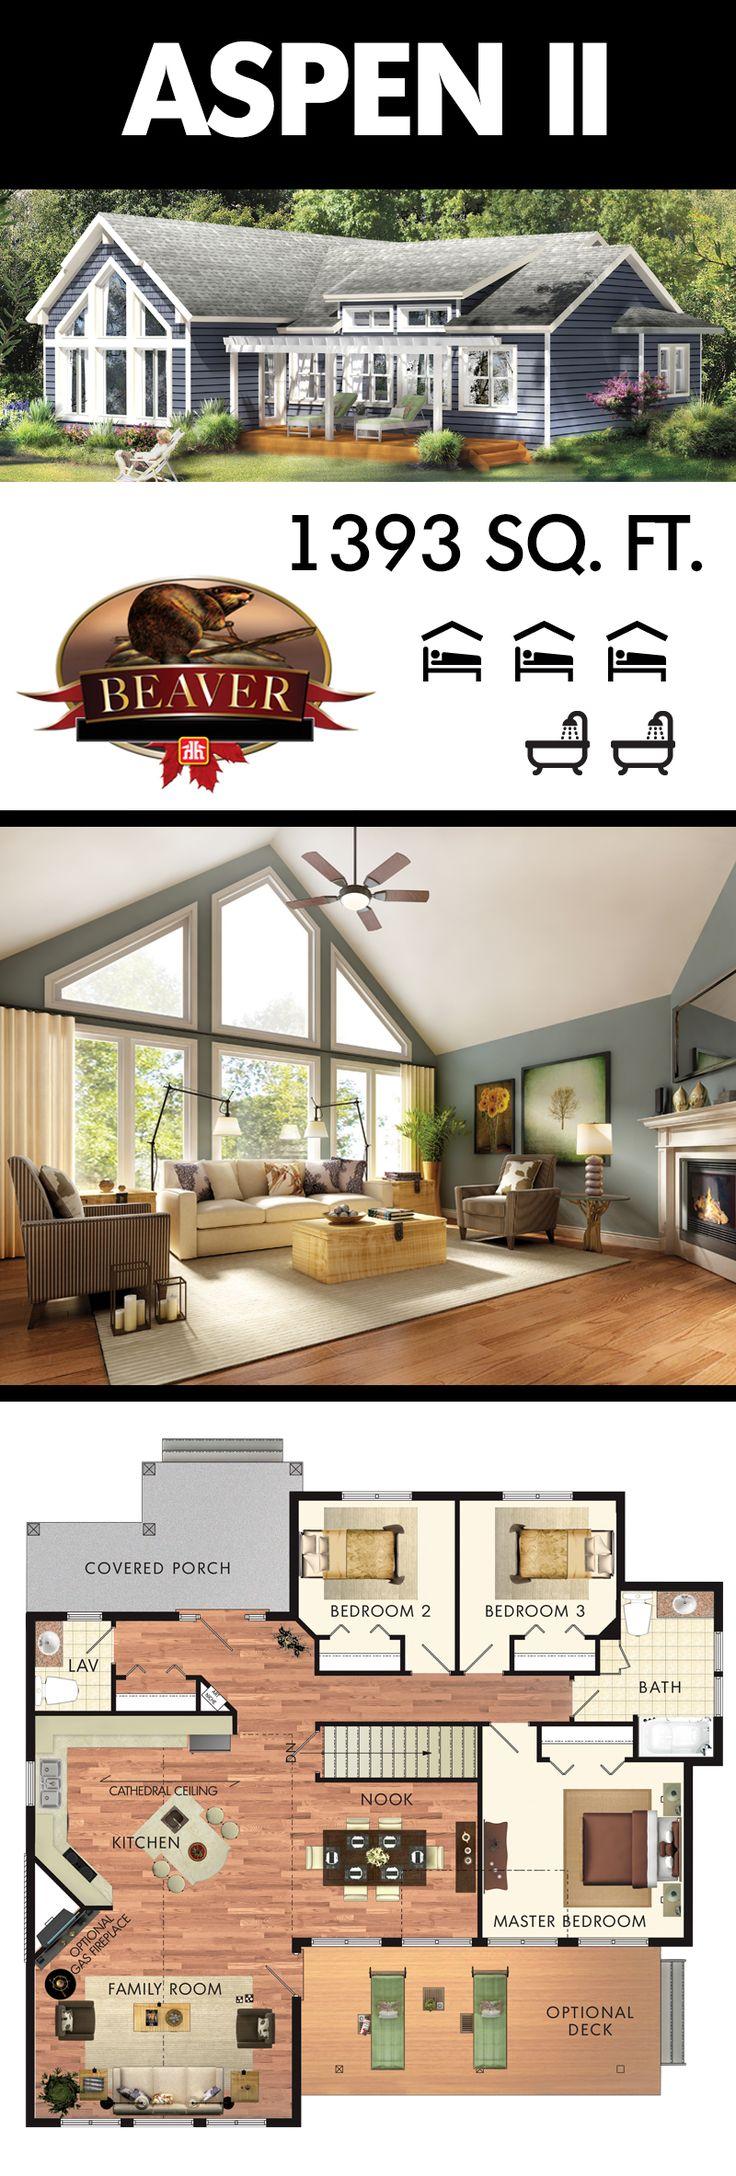 29c4e6ef1893c2050caa2735c5a22dd9 art niche window lights aspen style home designs home design,Aspen Style Home Designs